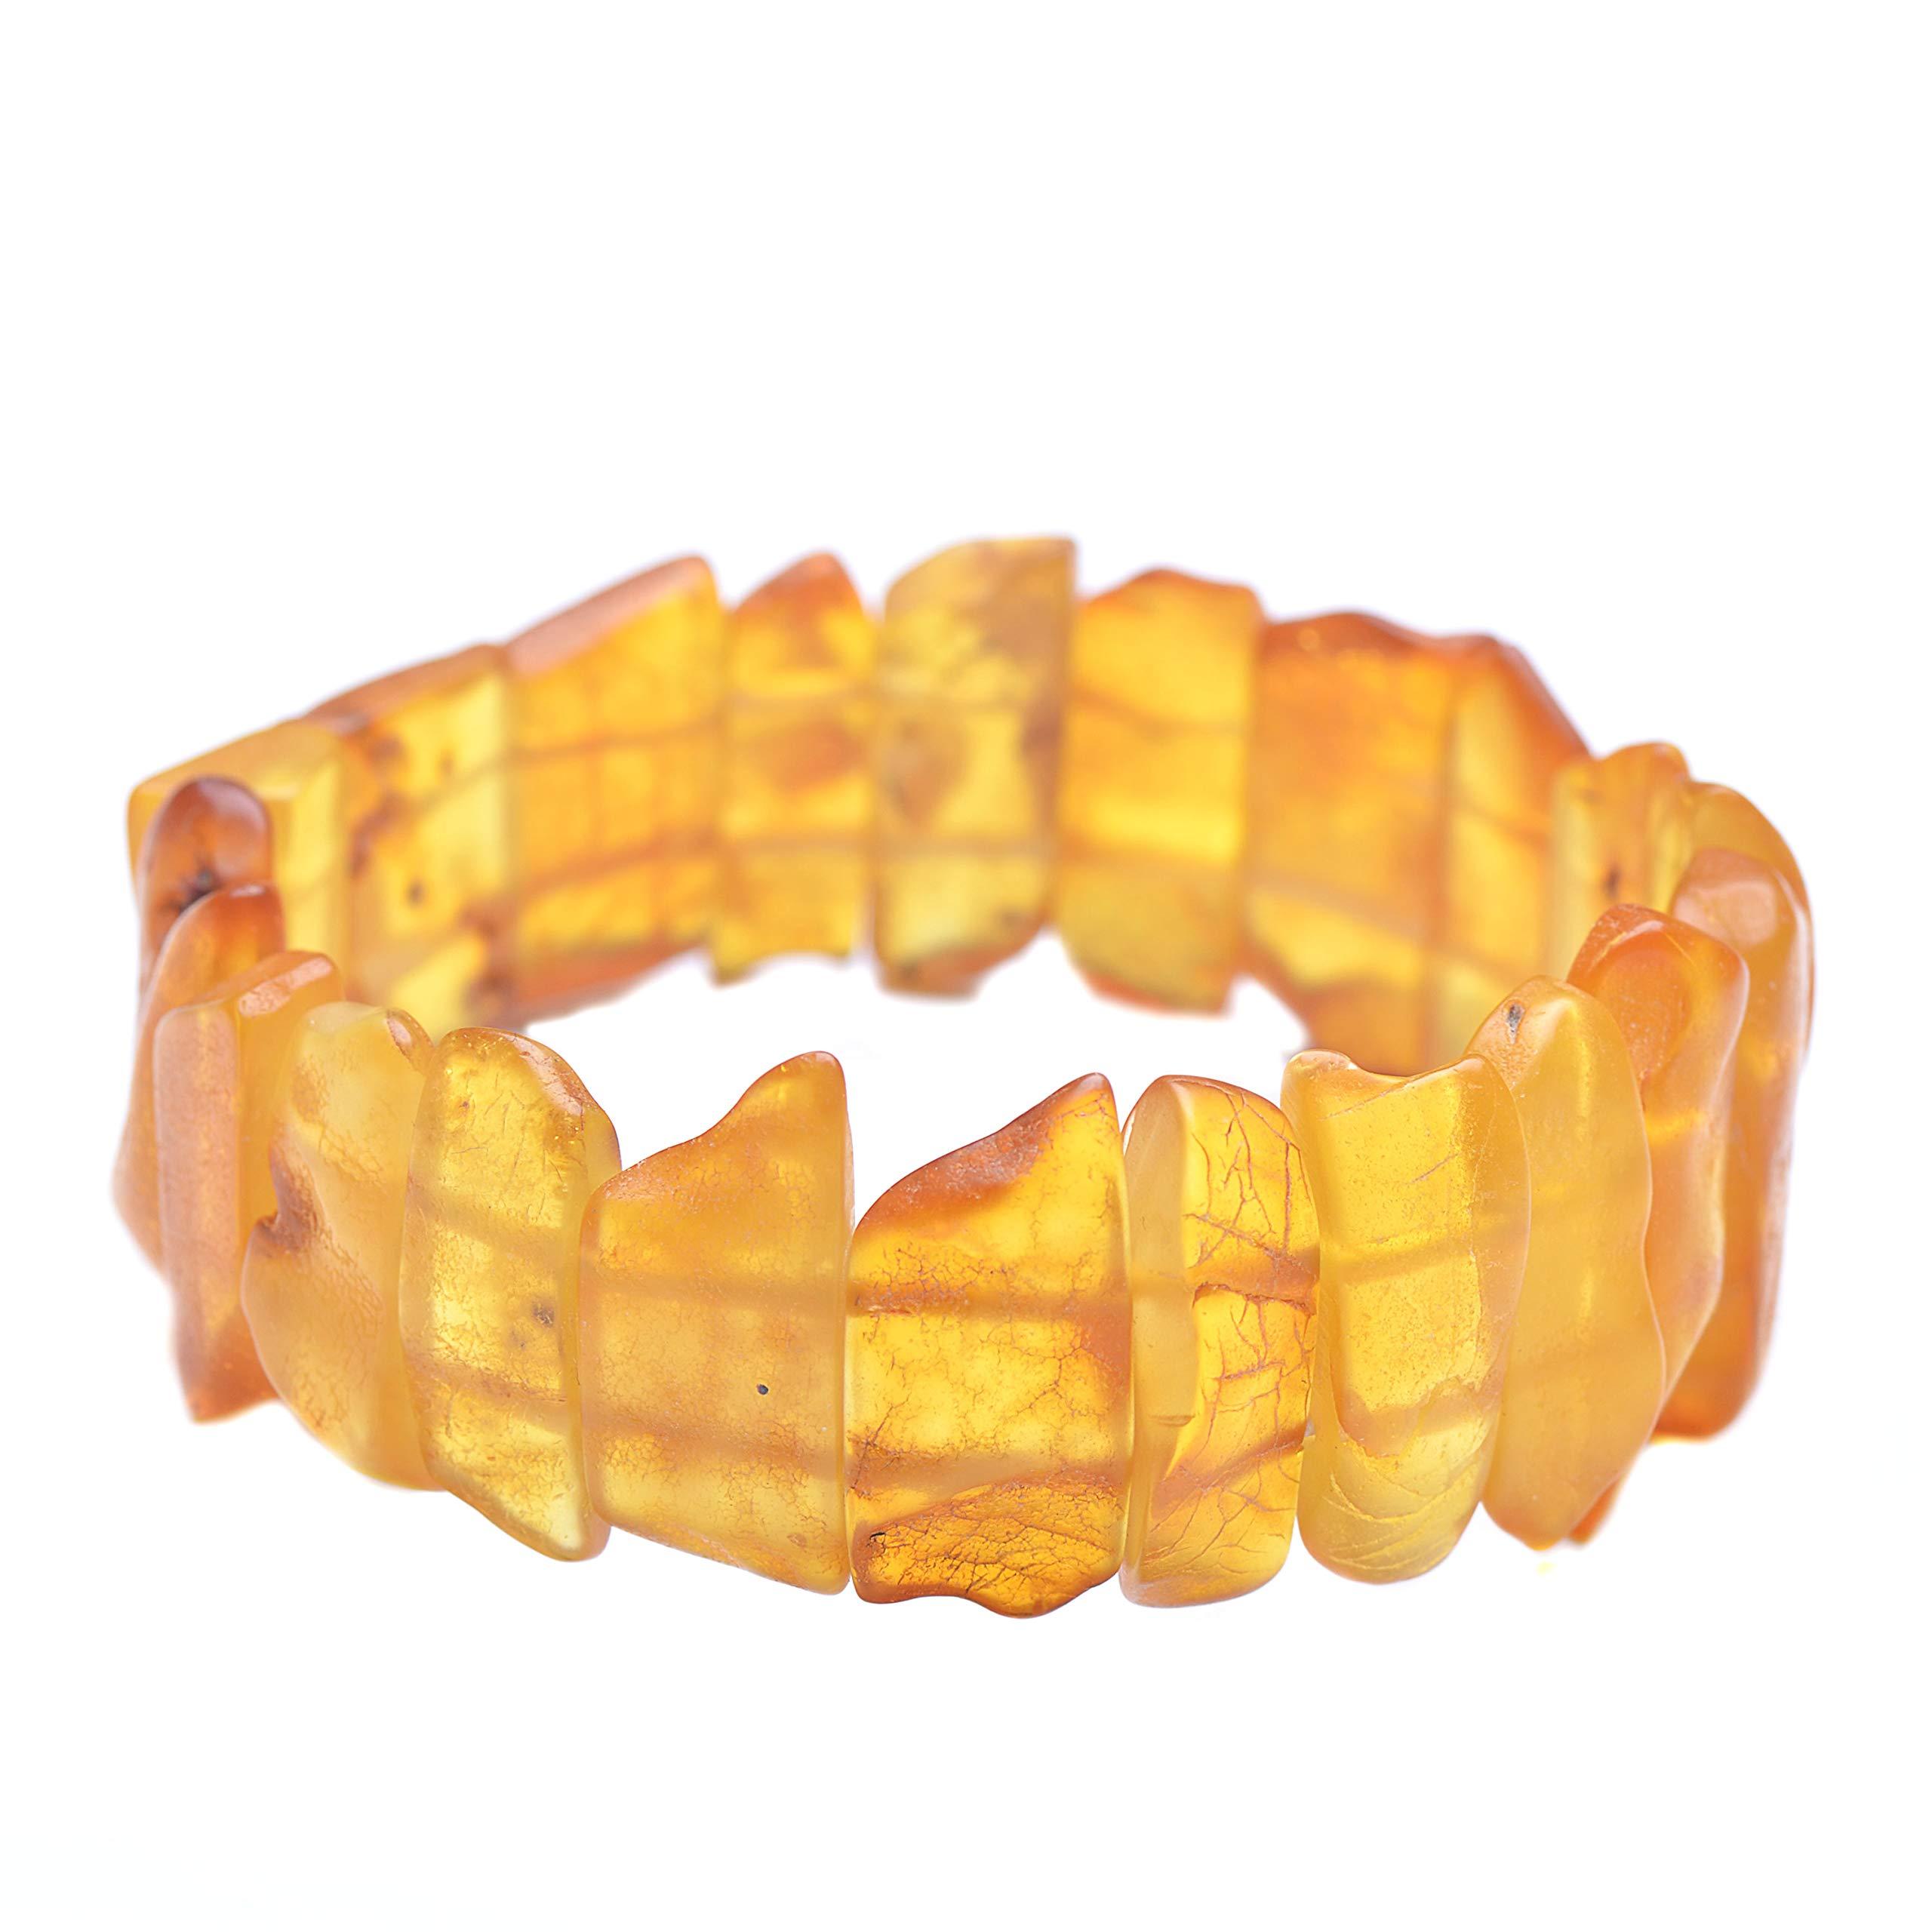 Amber Bracelet - Unique Amber Bracelet - Handmade Amber Jewelry - Baltic Amber Bracelet by Genuine Amber (Image #1)